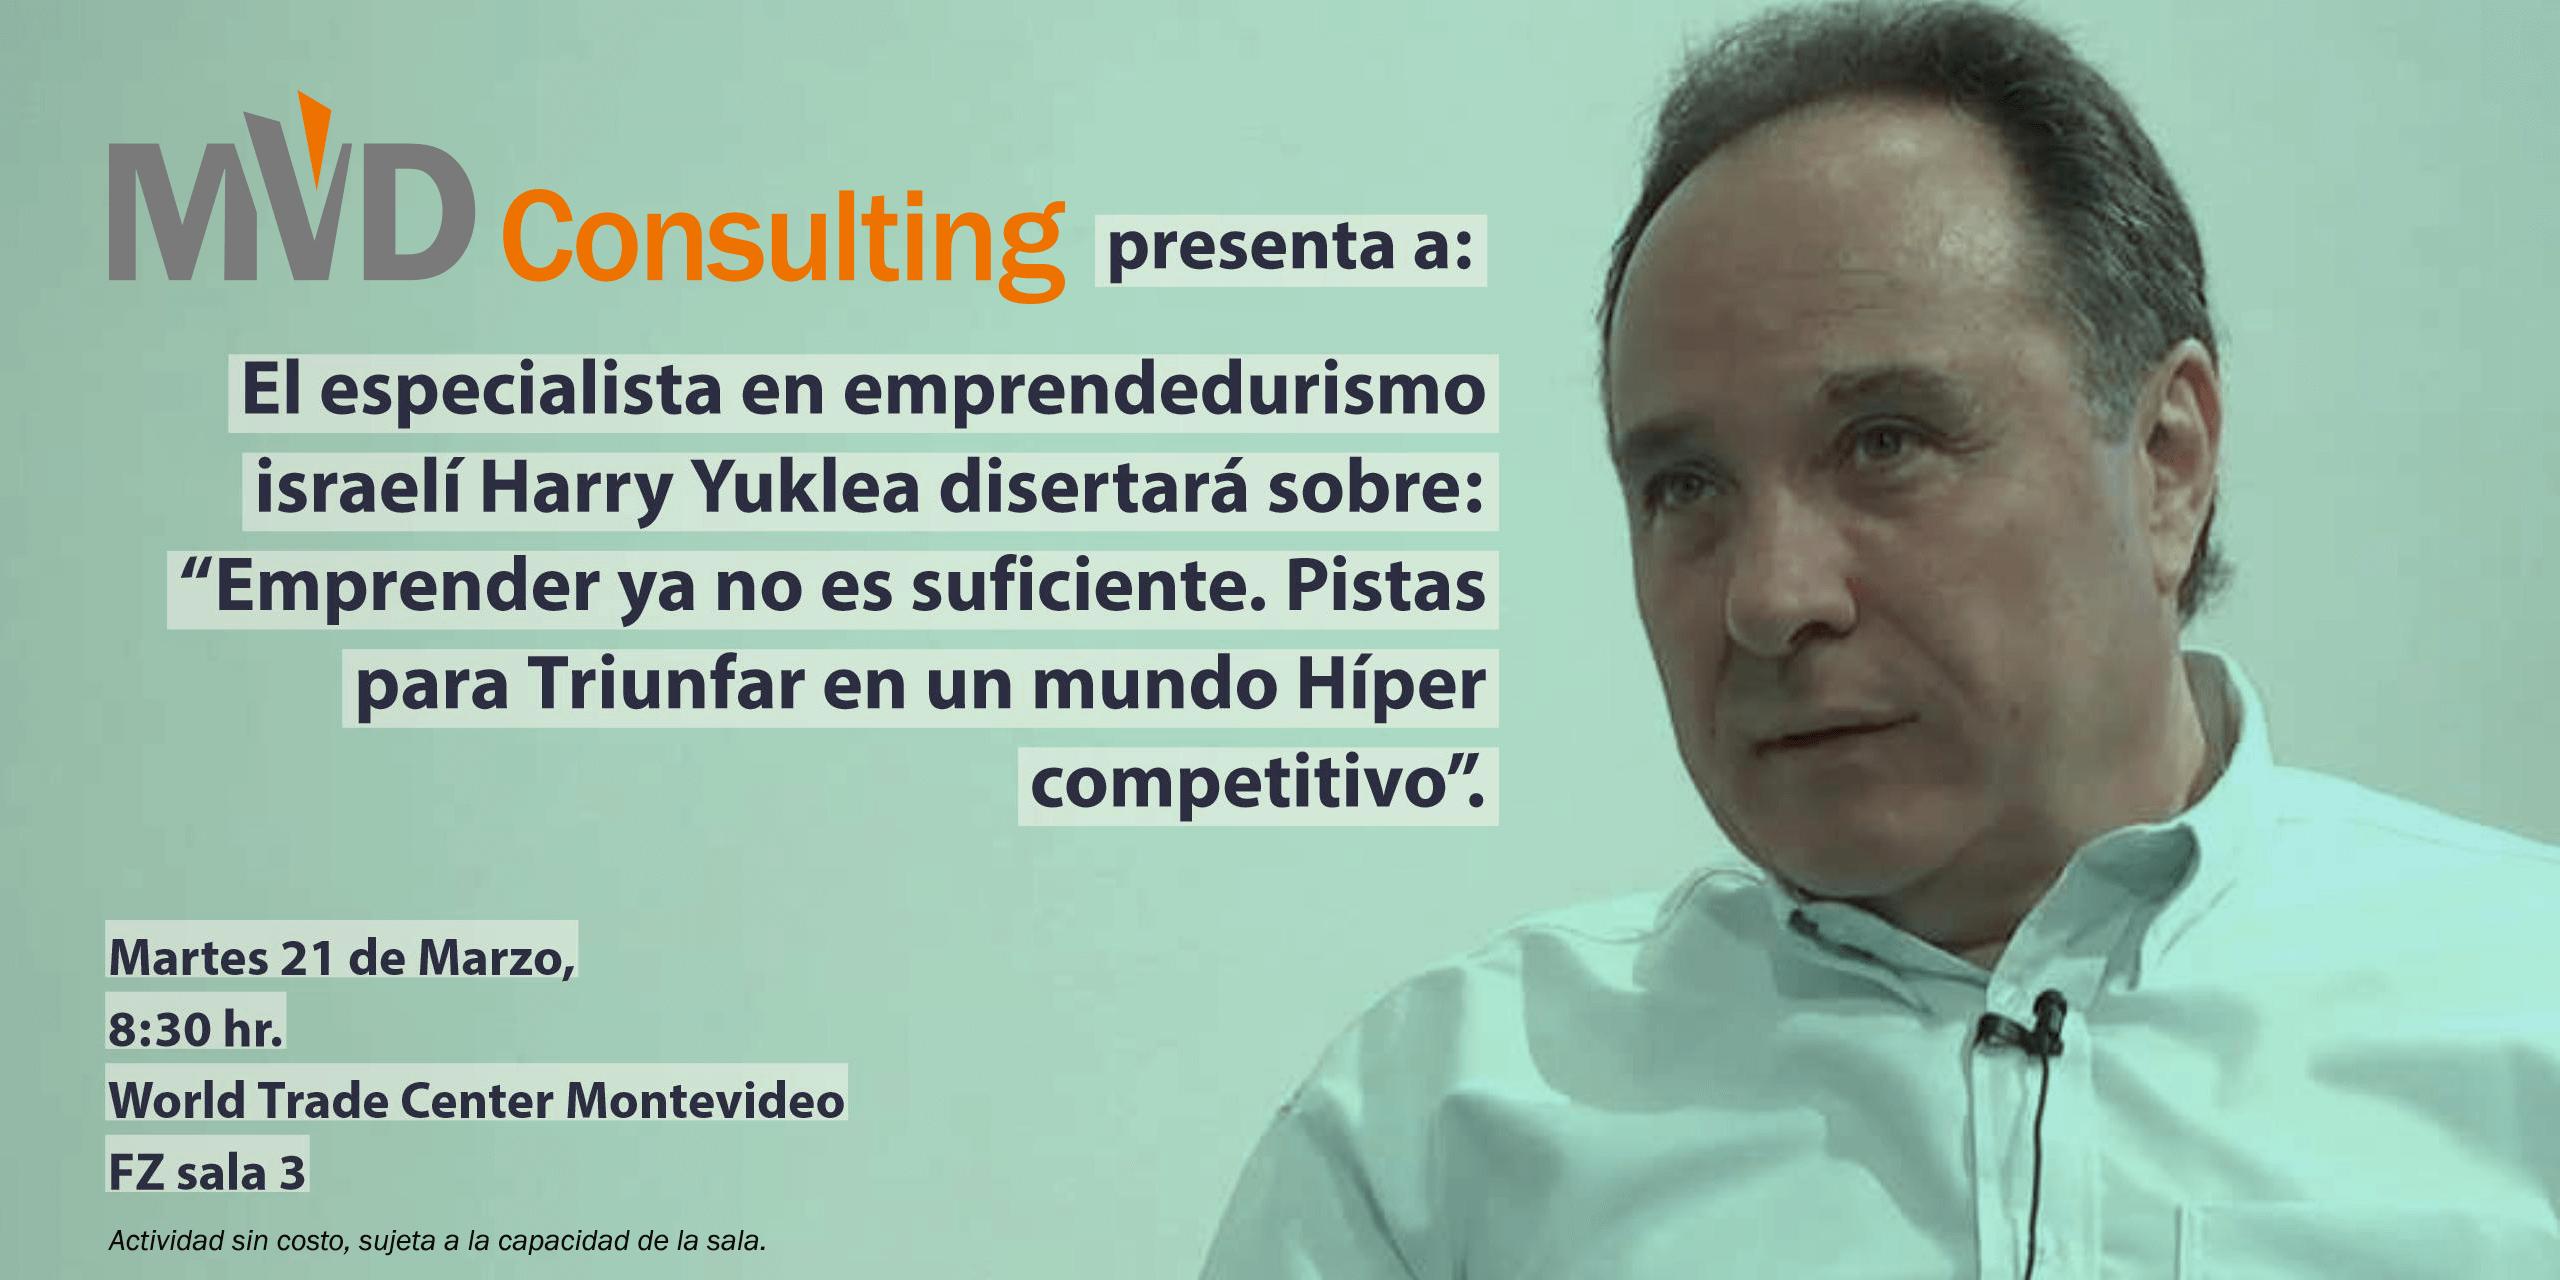 Harry Yuklea diserta para clientes de MVD Consulting